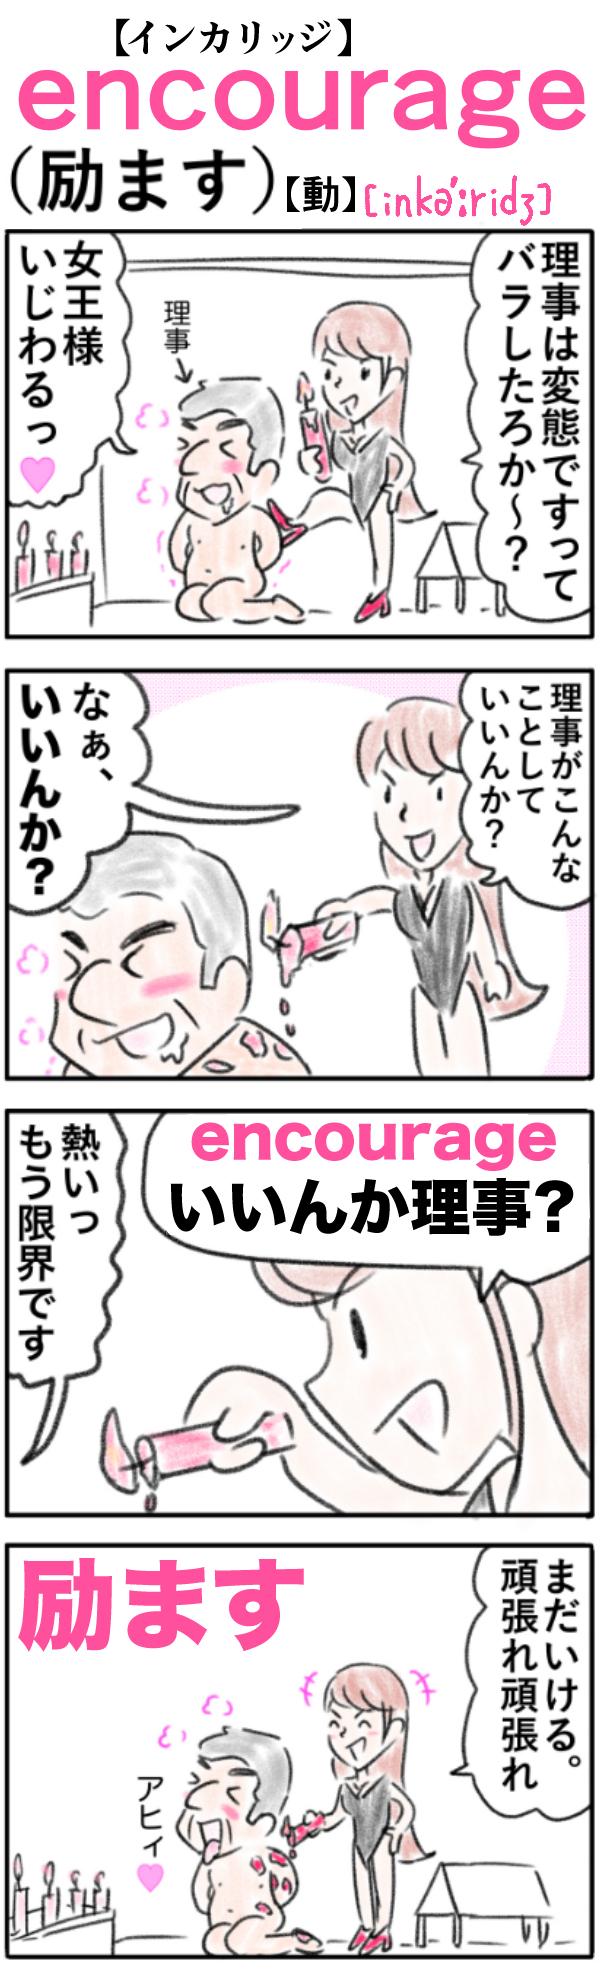 encourage(励ます)の語呂合わせ英単語